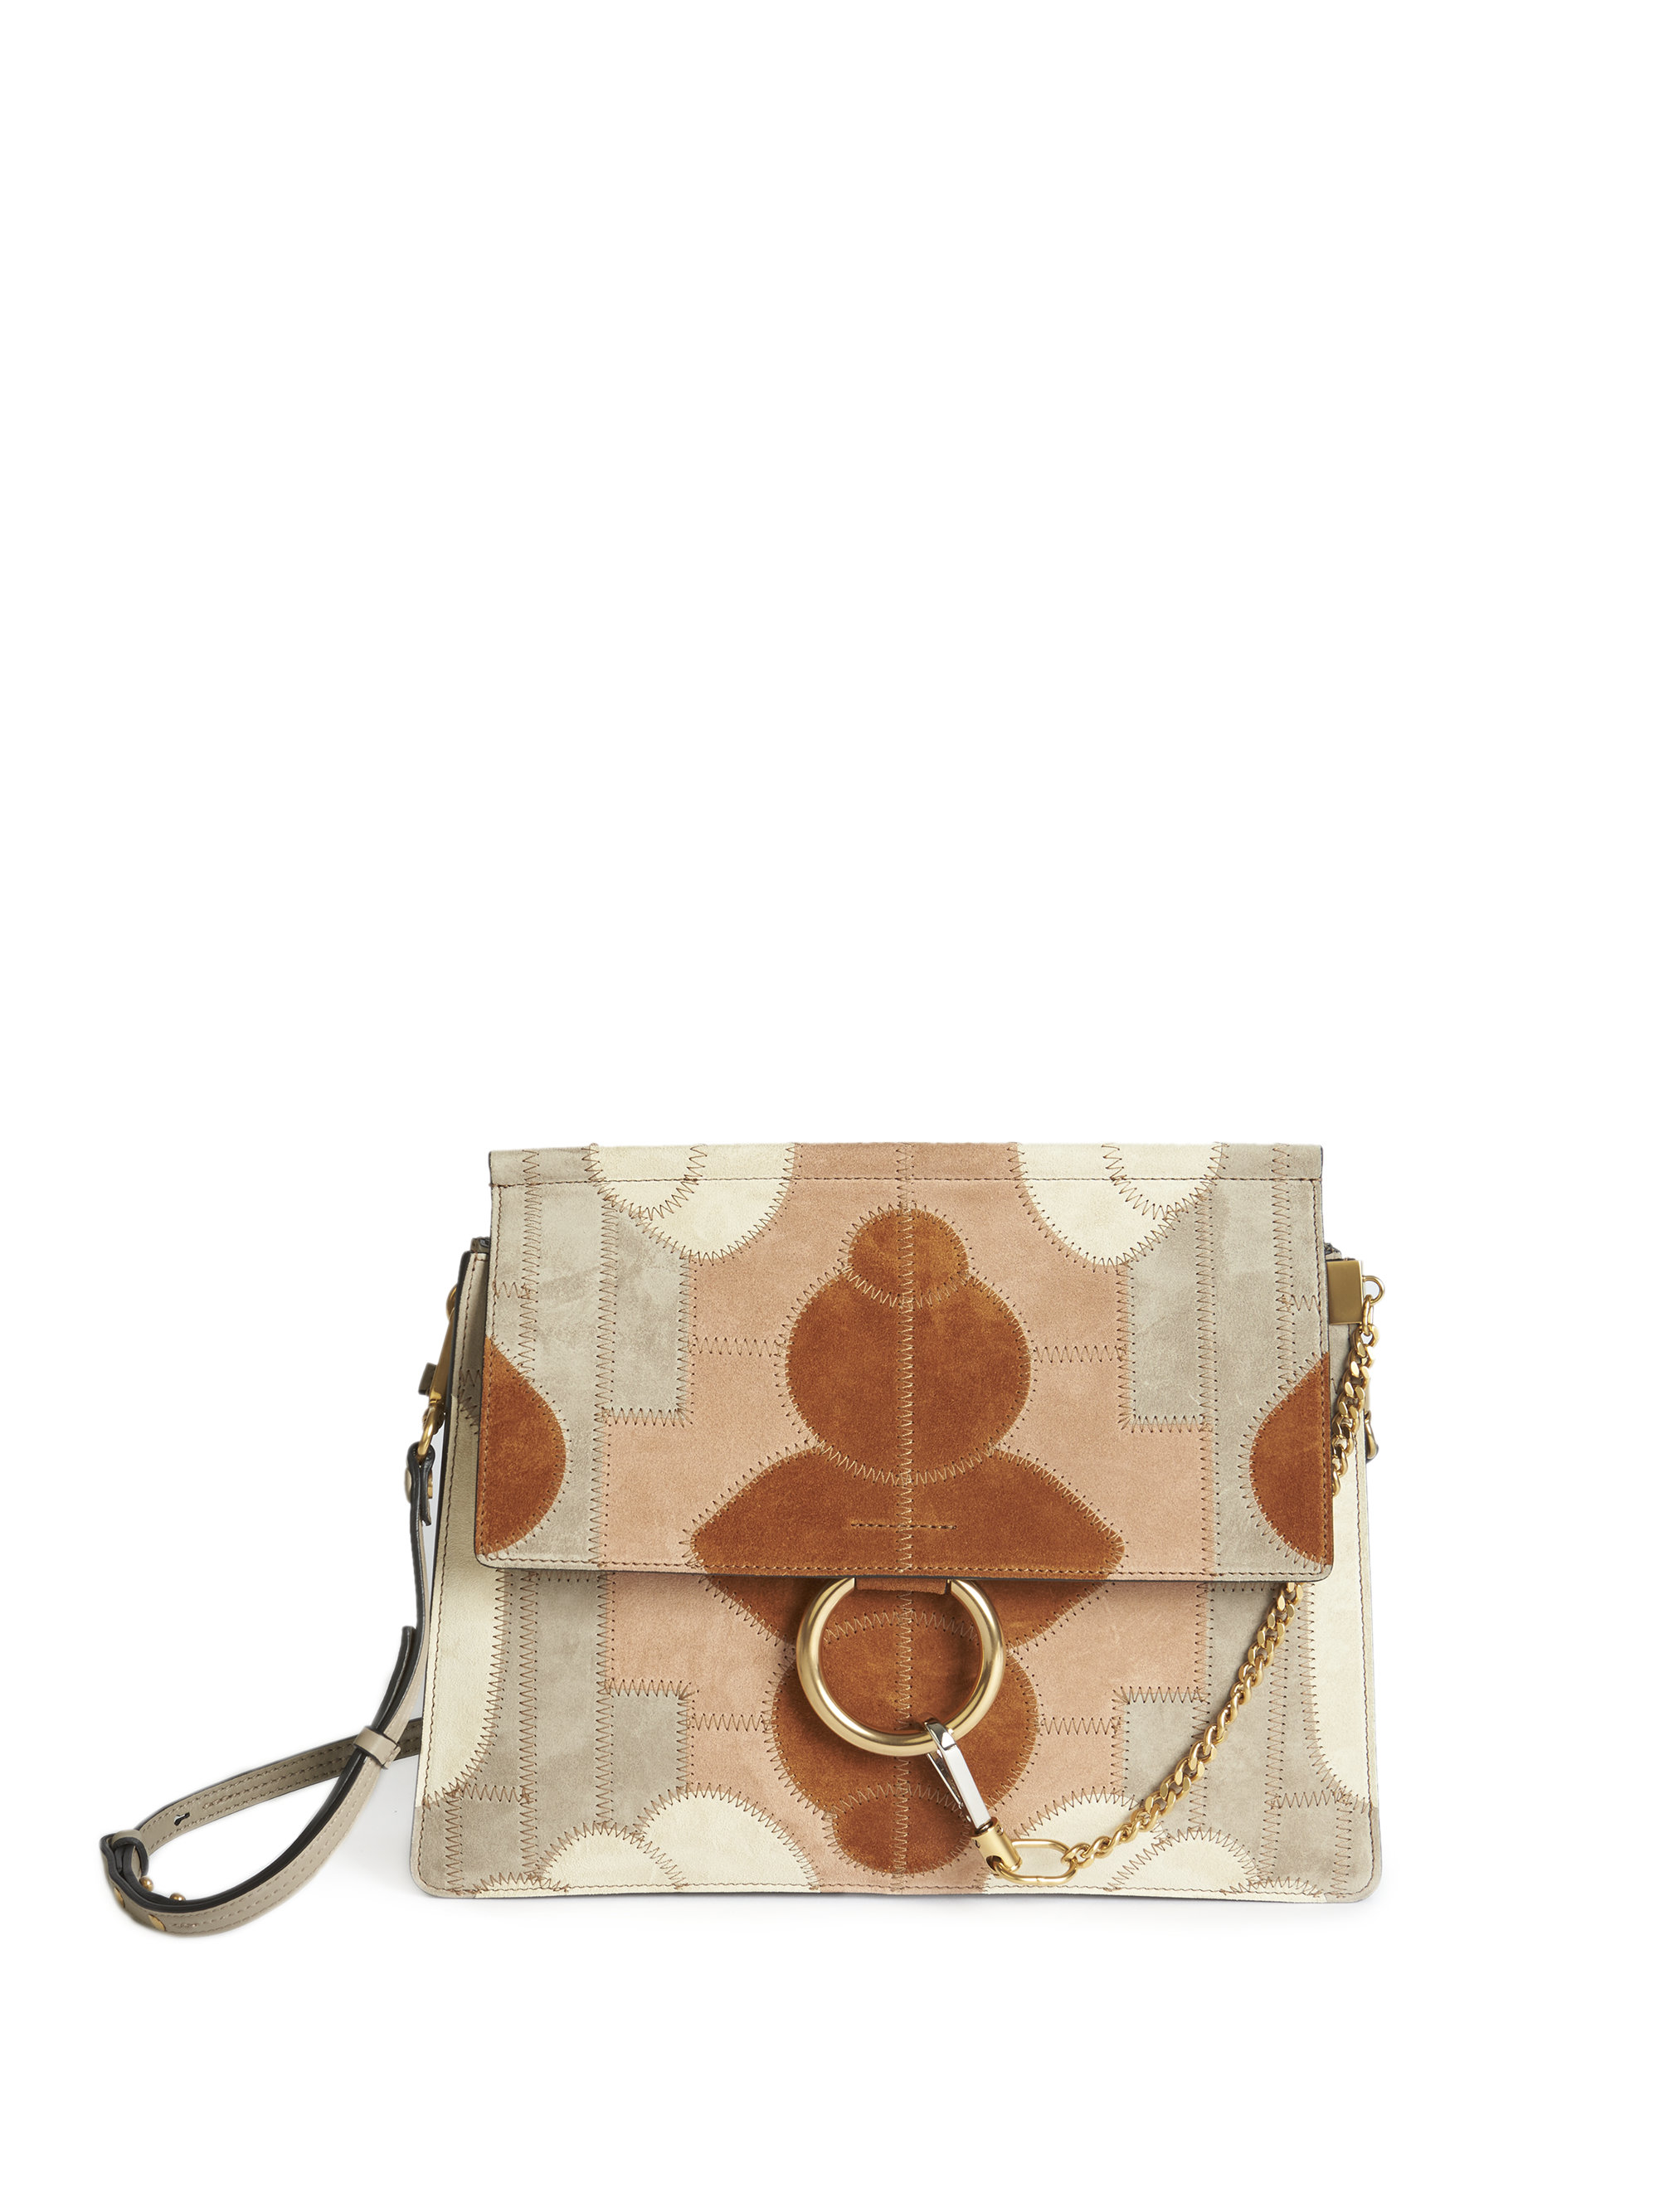 knockoff chloe handbags - Chlo�� Faye Medium Floral Patchwork Suede Shoulder Bag in Brown ...